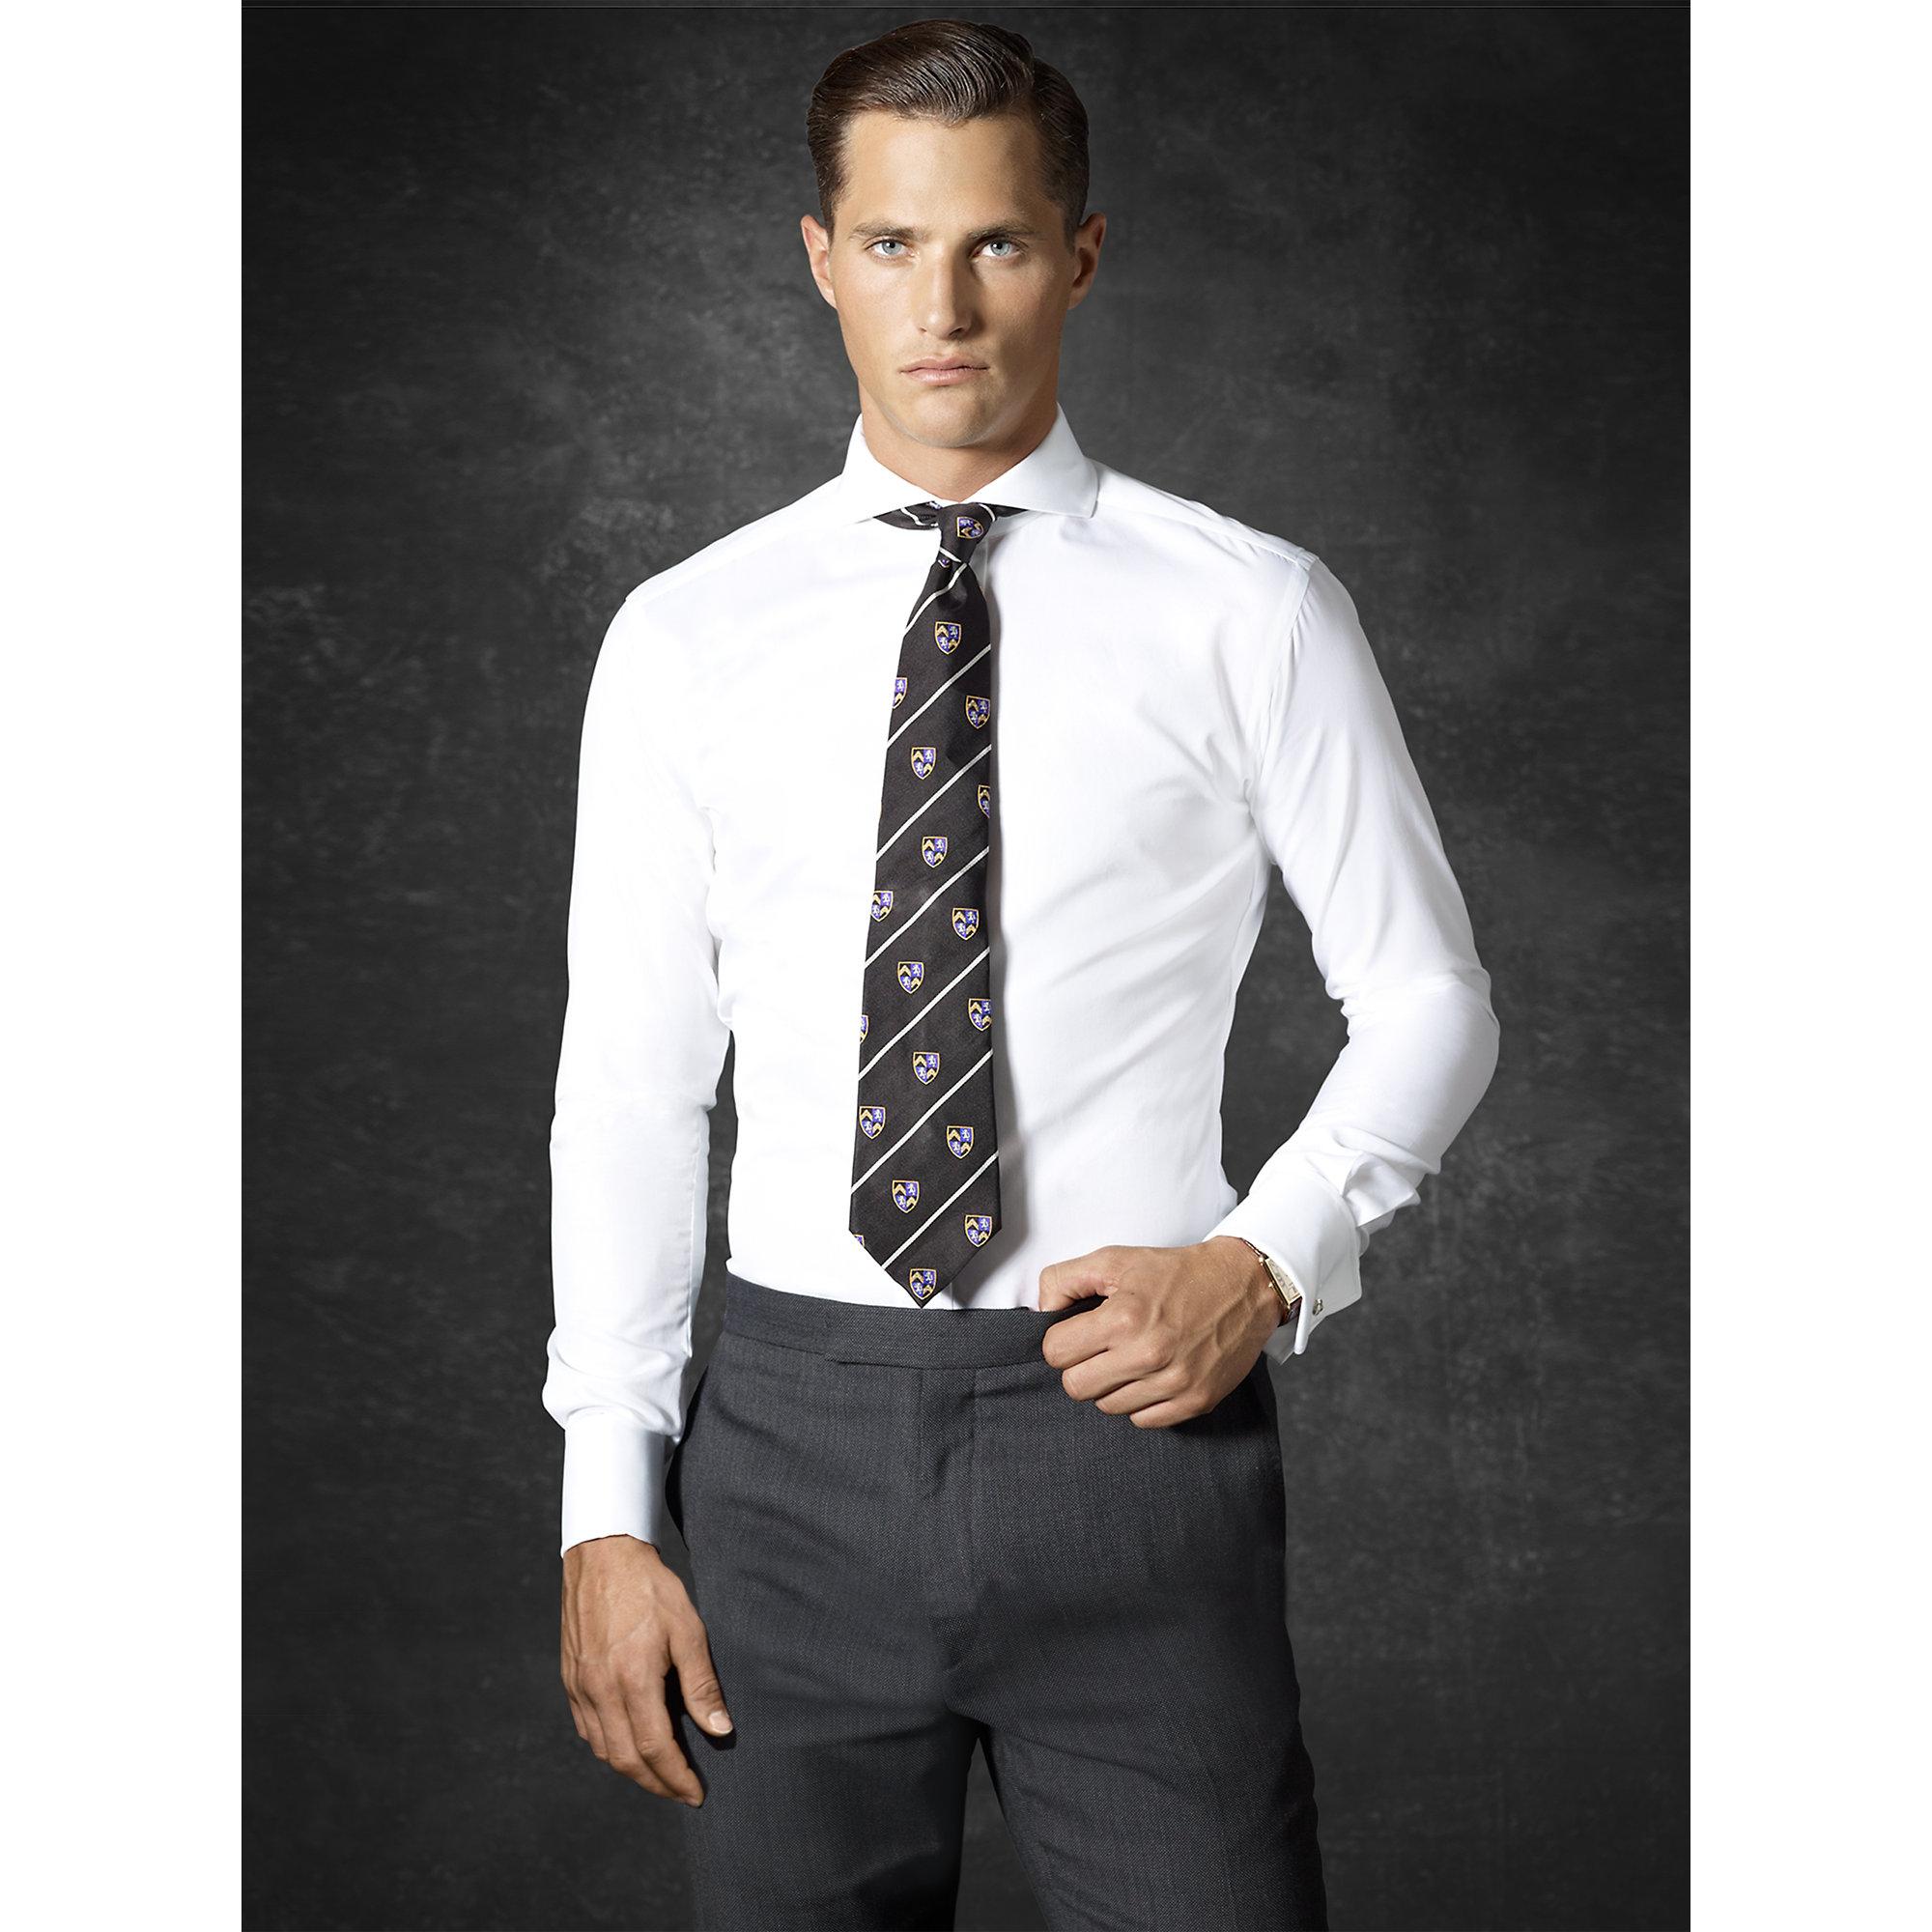 9cbf449070 ... coupon lyst ralph lauren purple label keaton twill shirt in white for  men 830f6 45f62